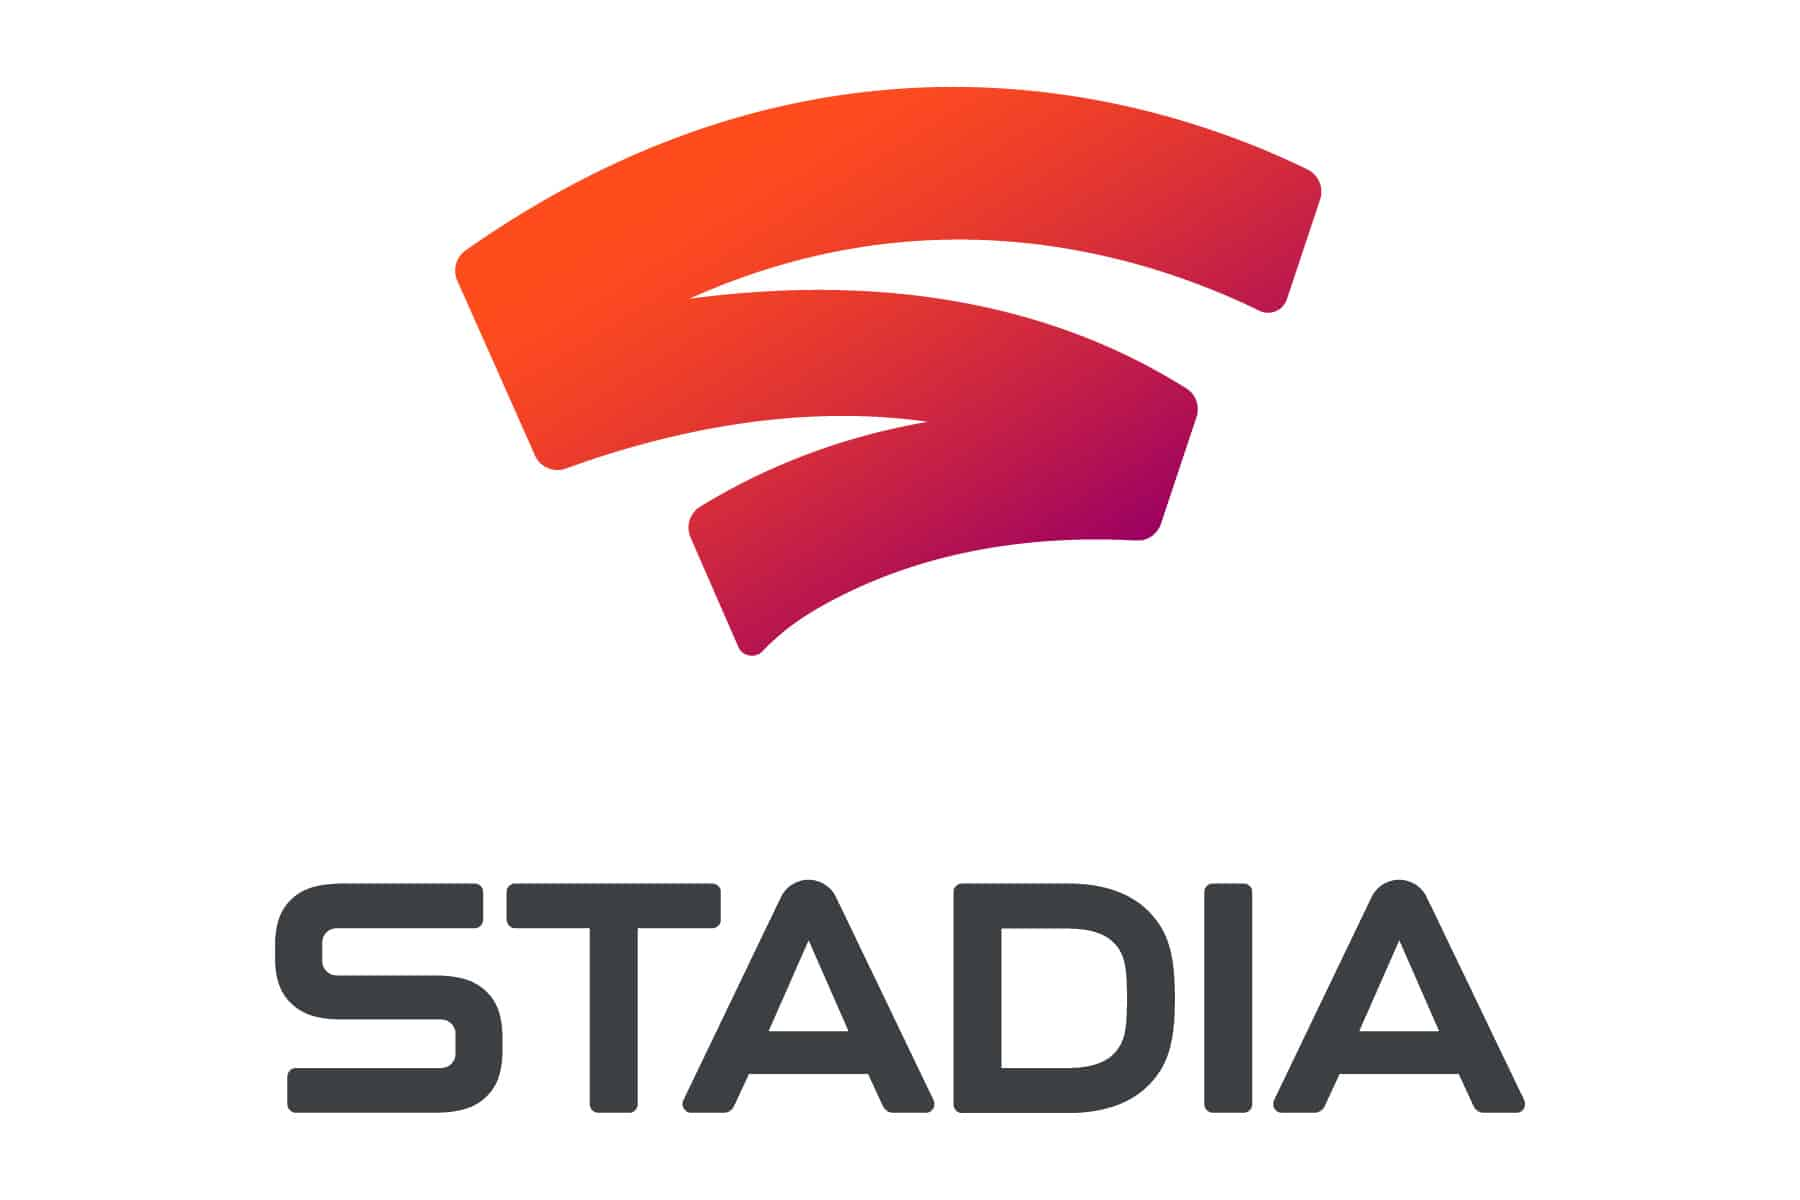 Logo Google Stadia Focal